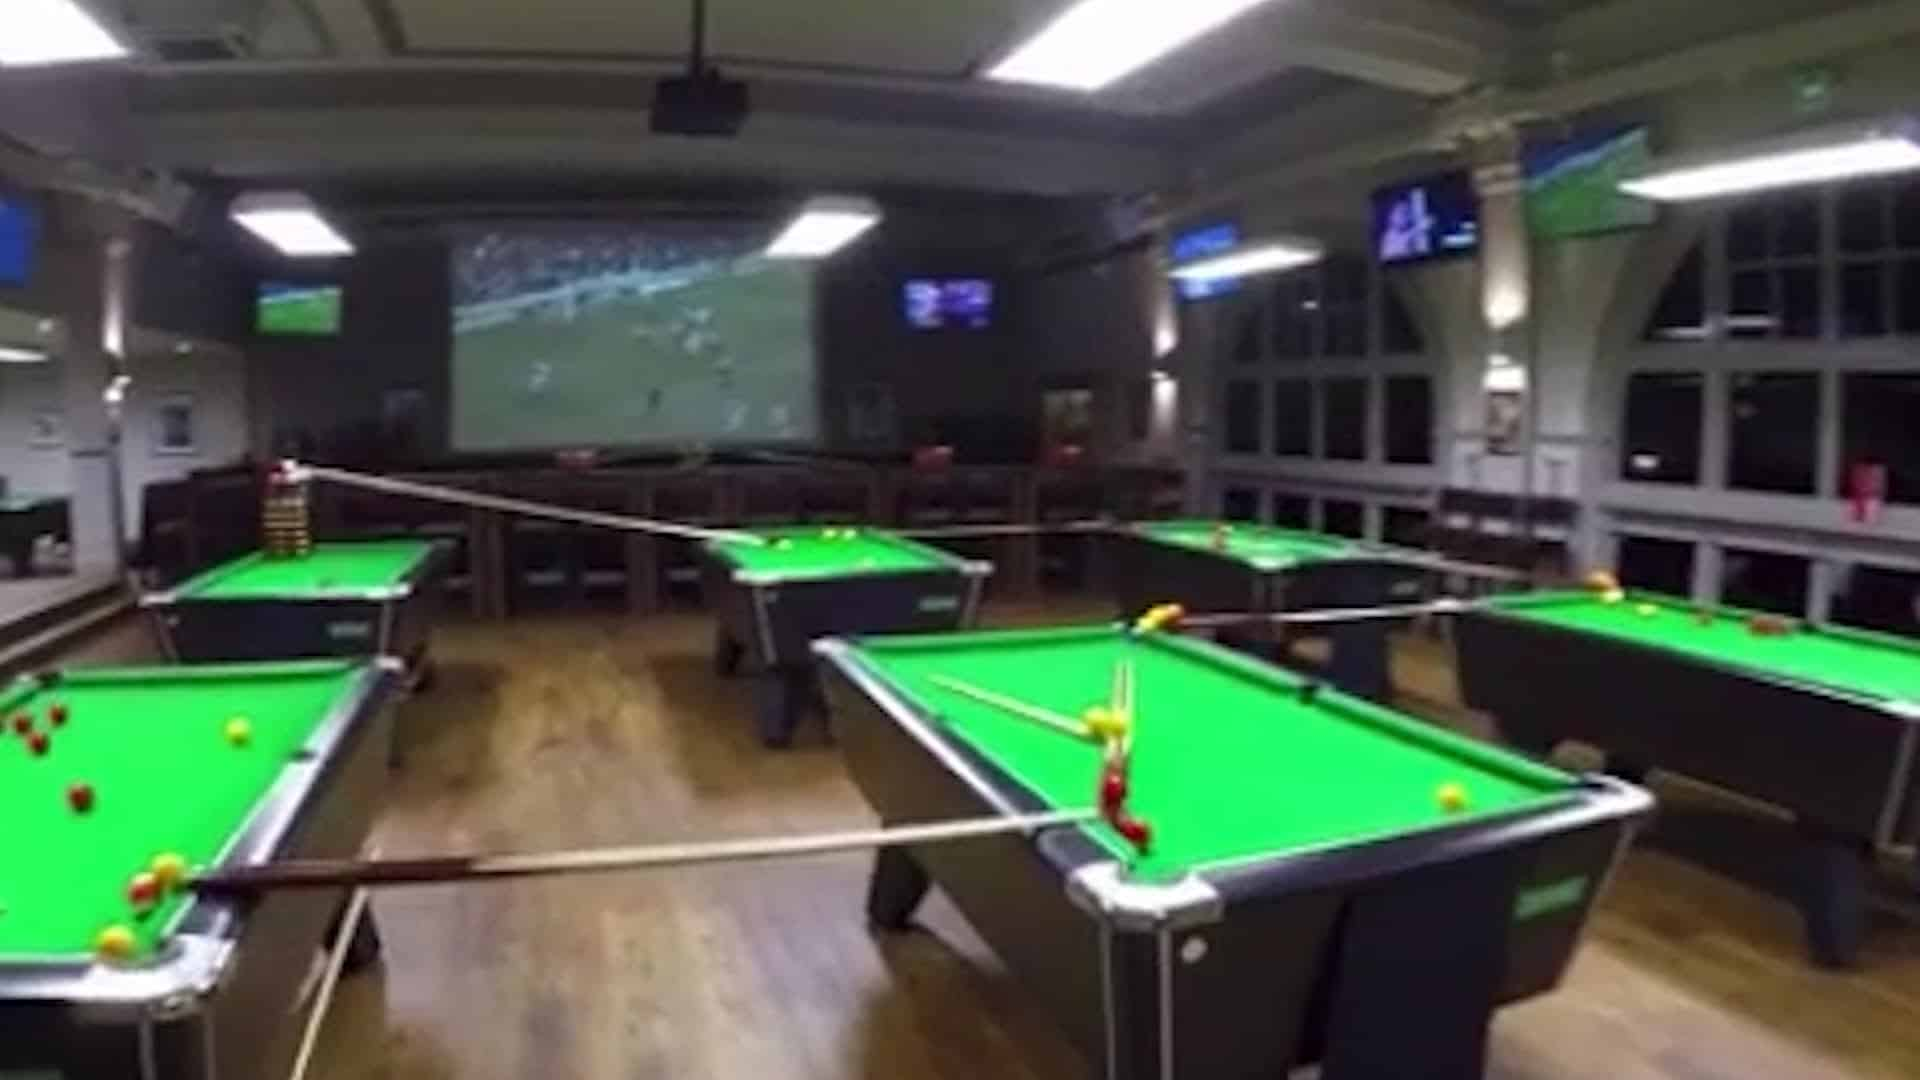 Billiards Trick Shot over dozens of pool tables away   Dravens Tales